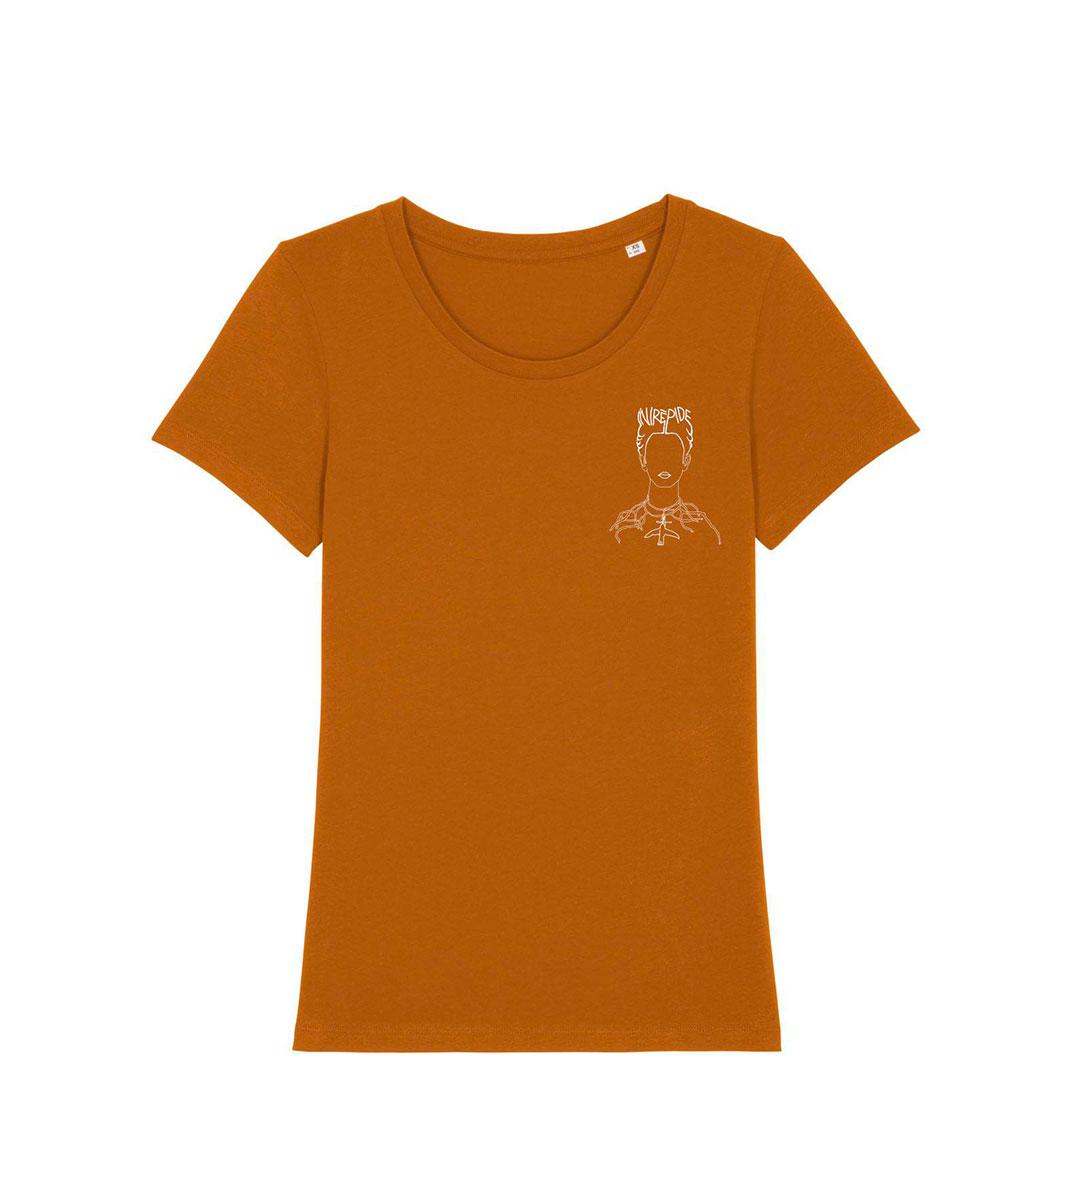 T-shirt camel FRIDA, mockup leonor roversi